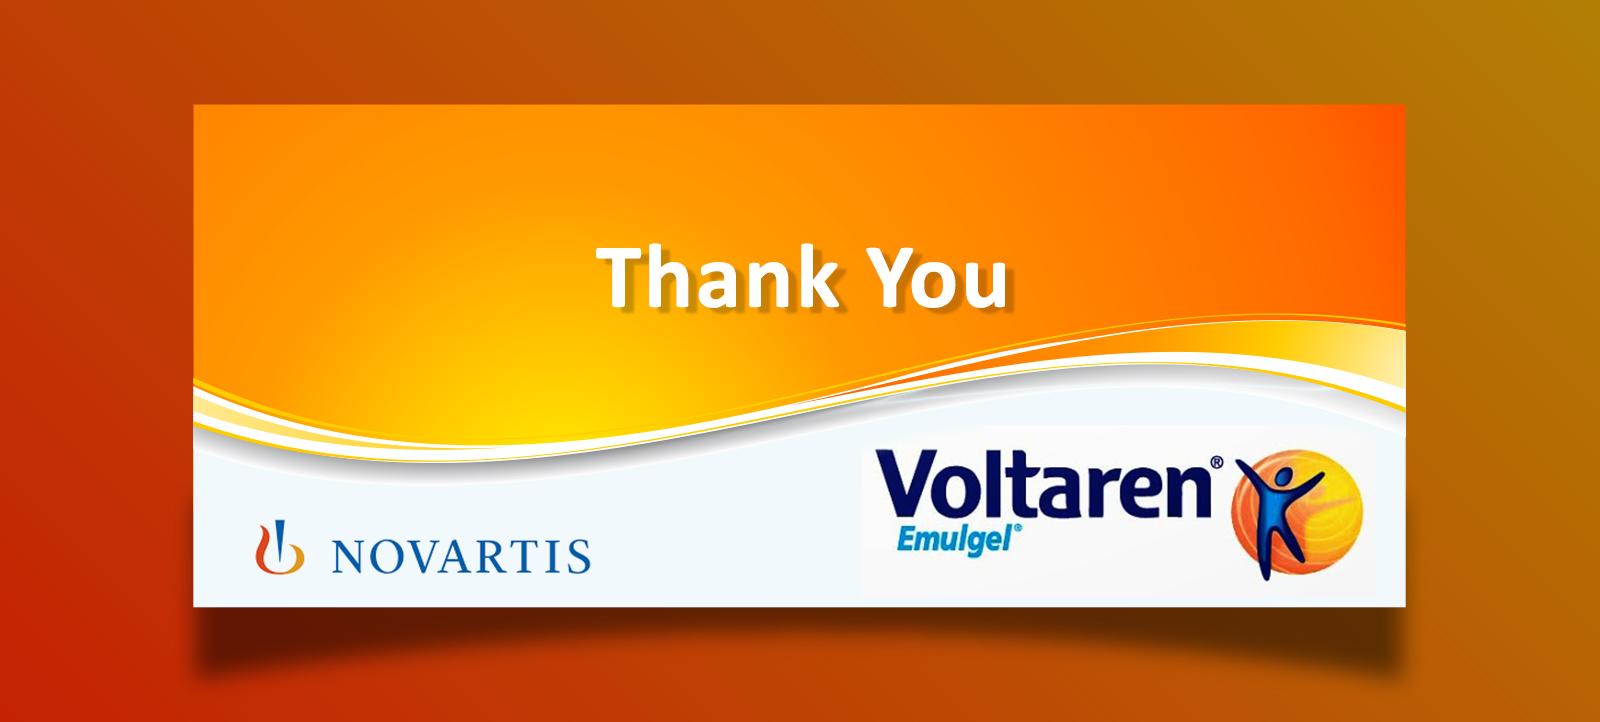 Thank you Novartis, Voltaren Emulgel Graphic Design for Package and Poster